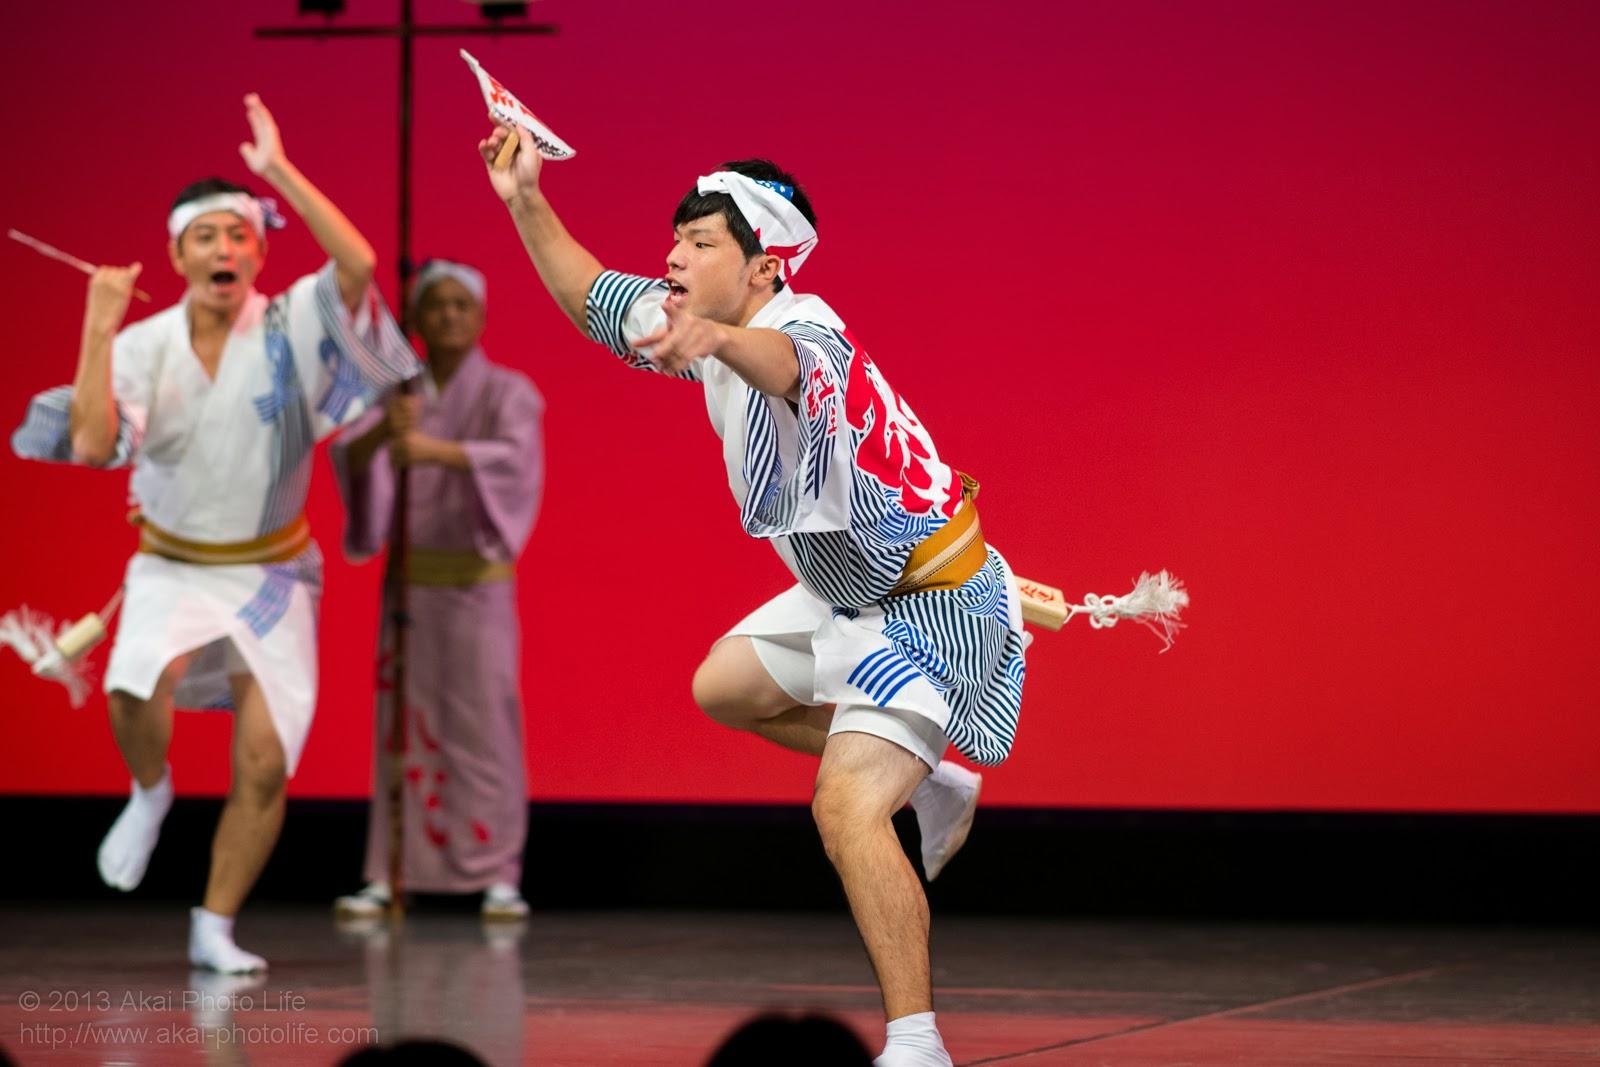 小金井市民文化祭、紅連の男踊り